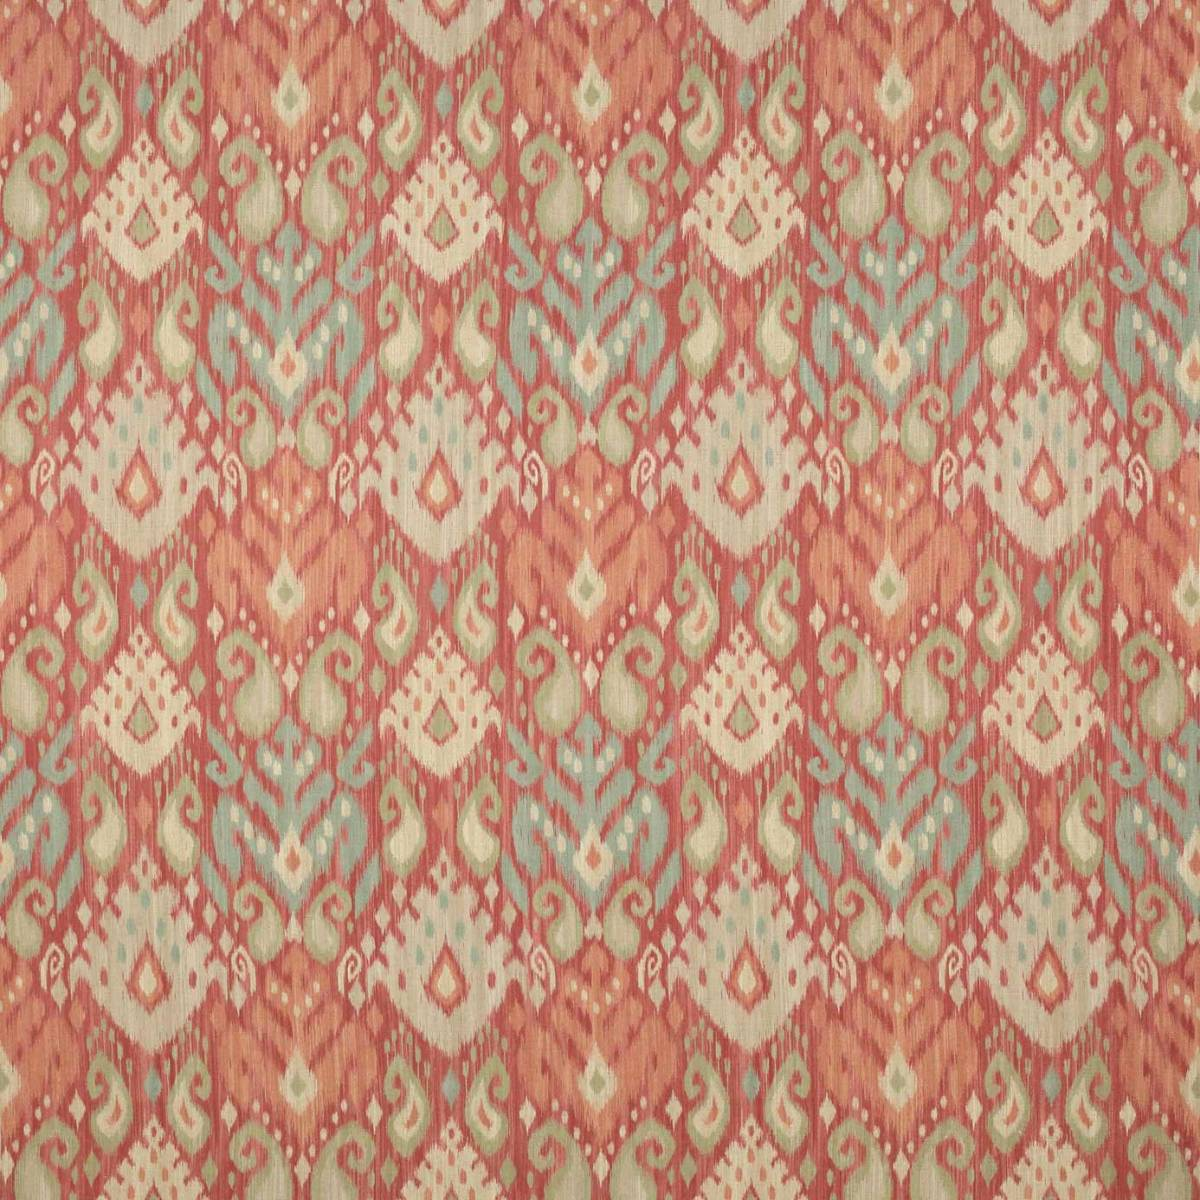 Melior Fabric Red F4647 02 Colefax Amp Fowler Oriana